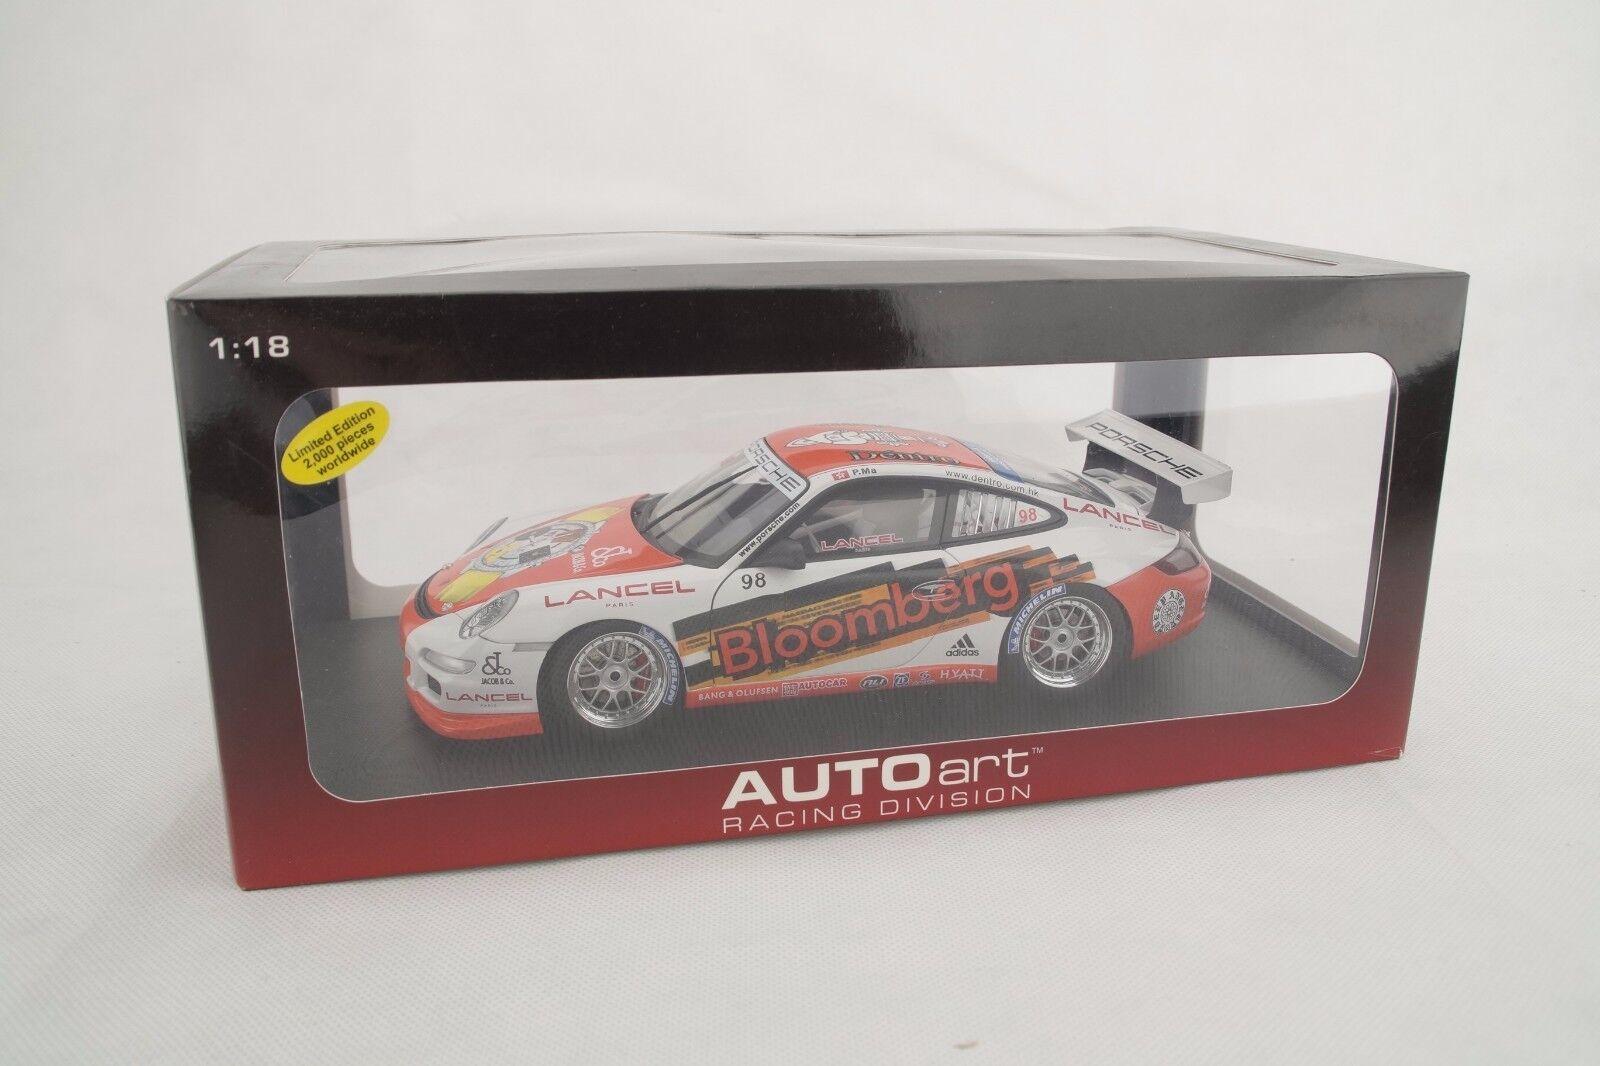 Autoart Porsche 911 (997) GT3 Cup 2018 P. Ma 98 - Bloomberg - Nuevo / Caja